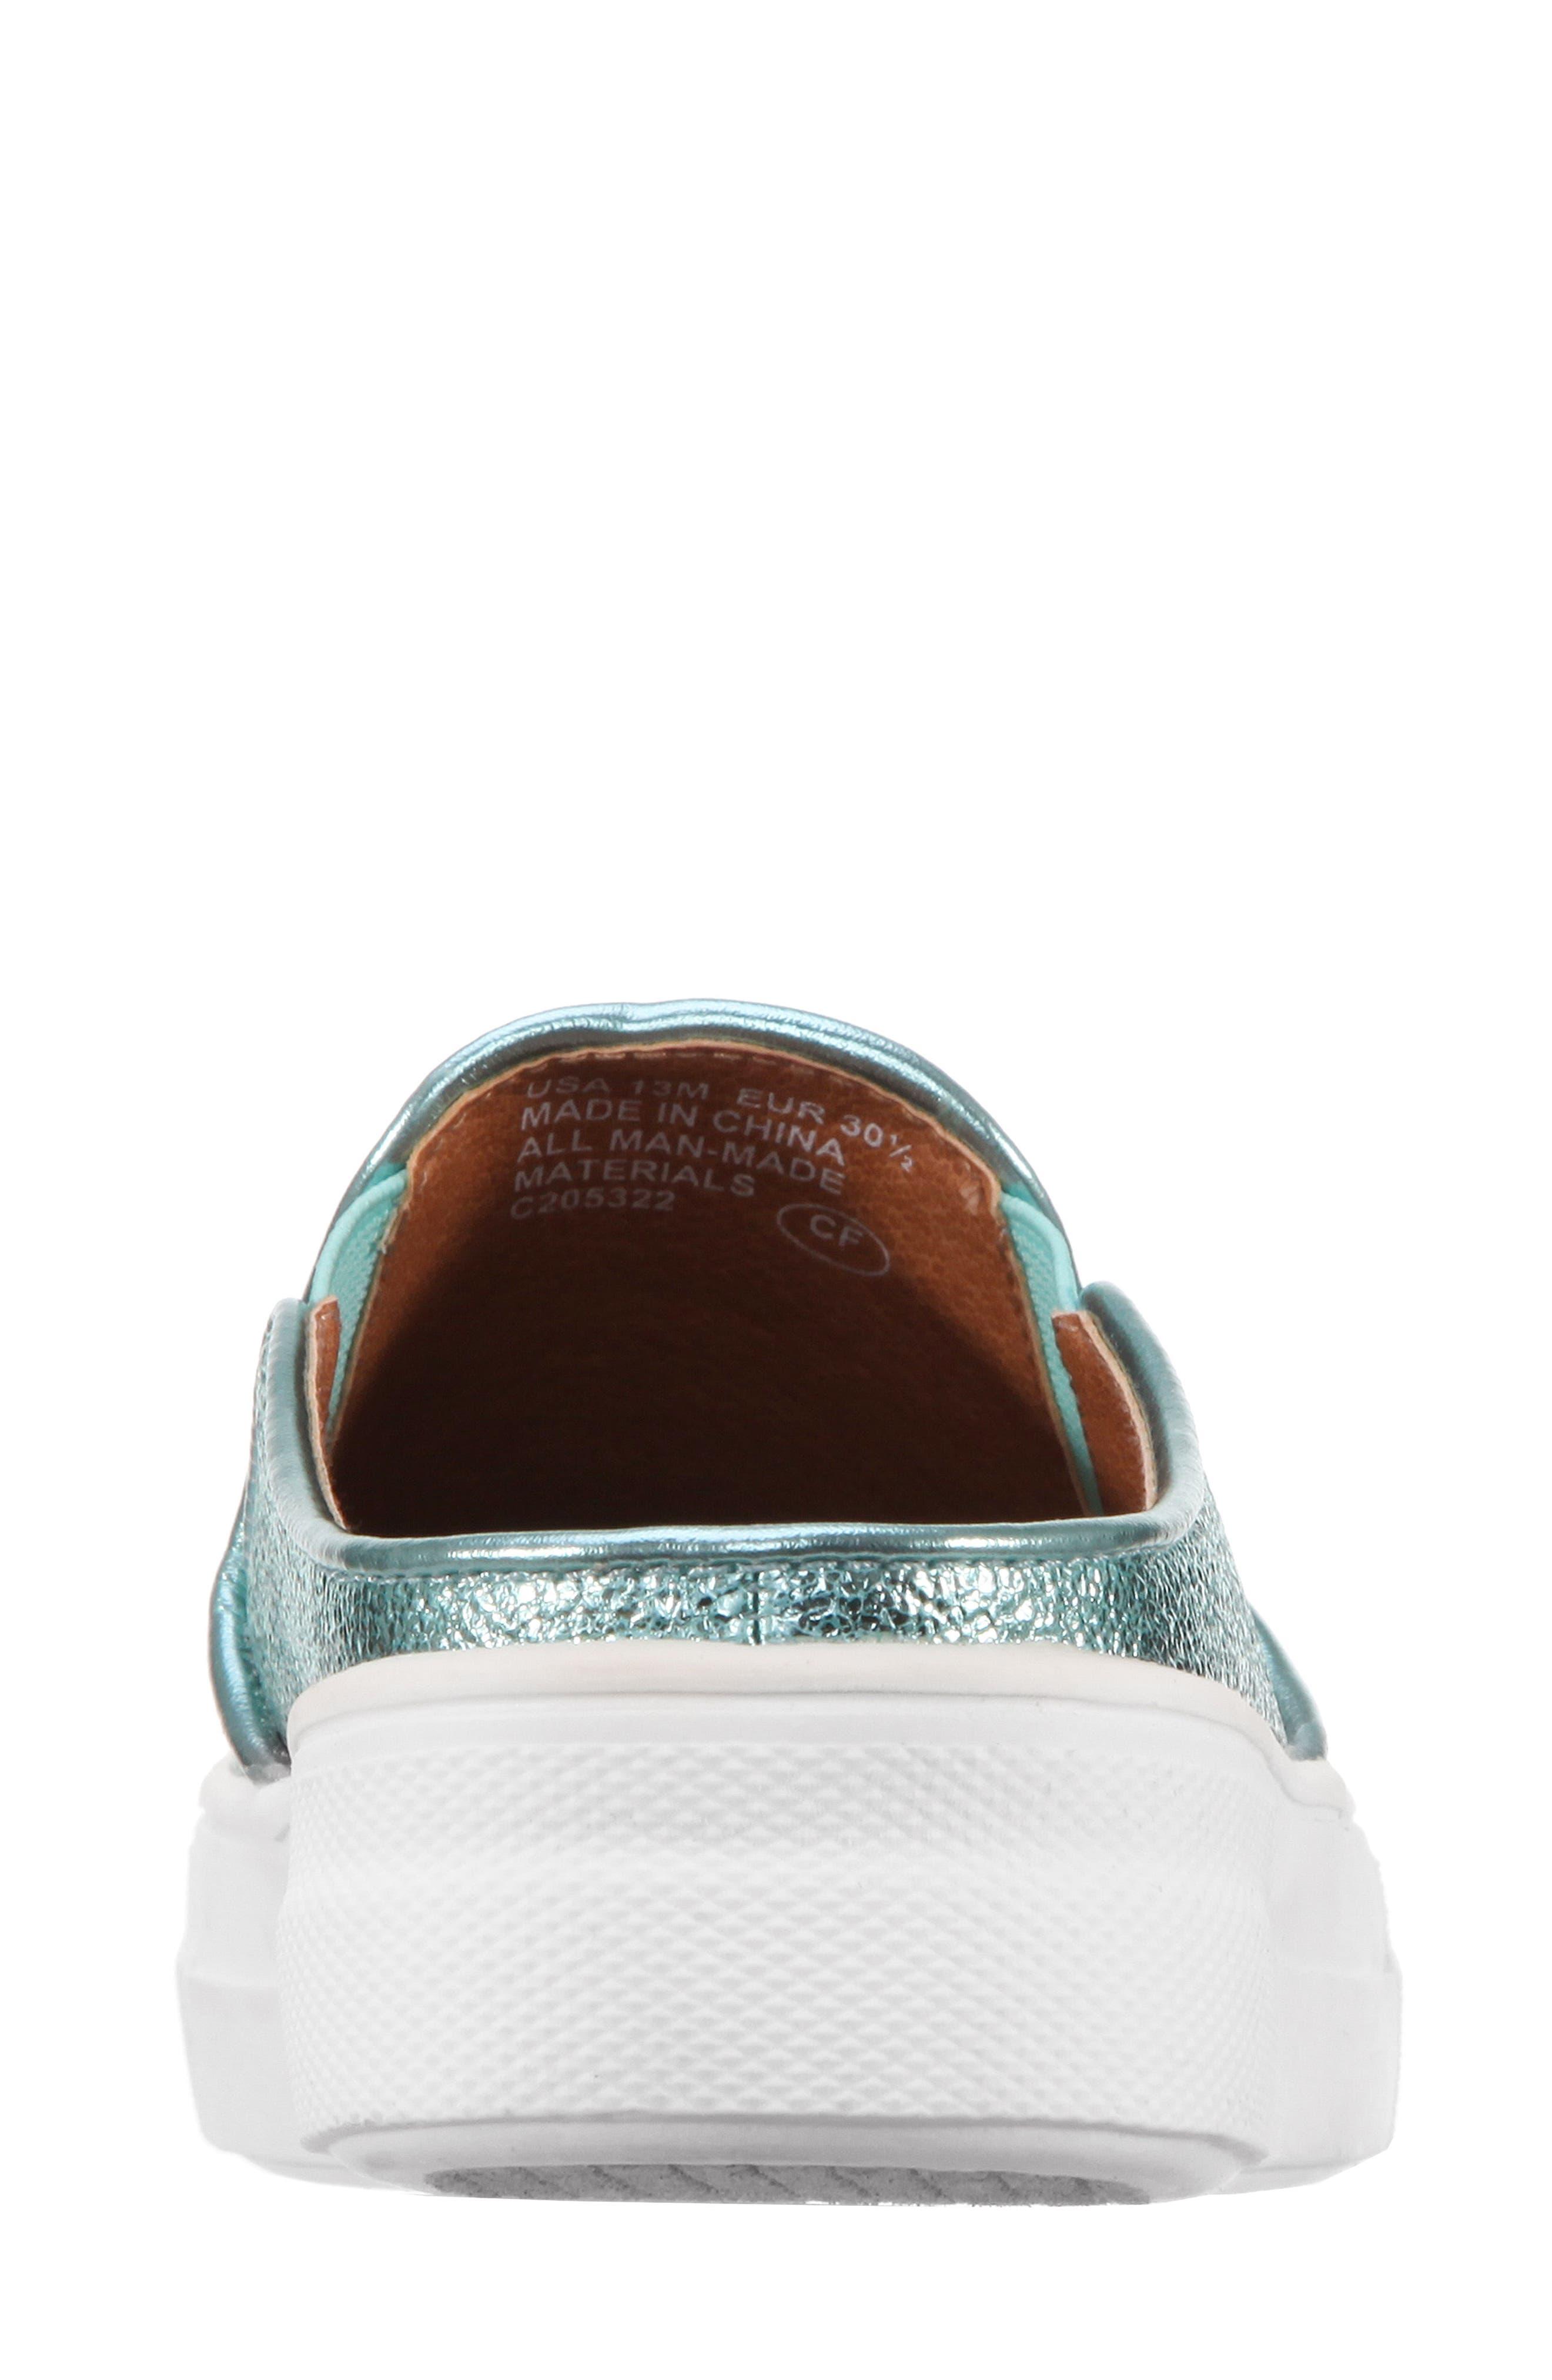 Gail Metallic Slip-On Sneaker Mule,                             Alternate thumbnail 5, color,